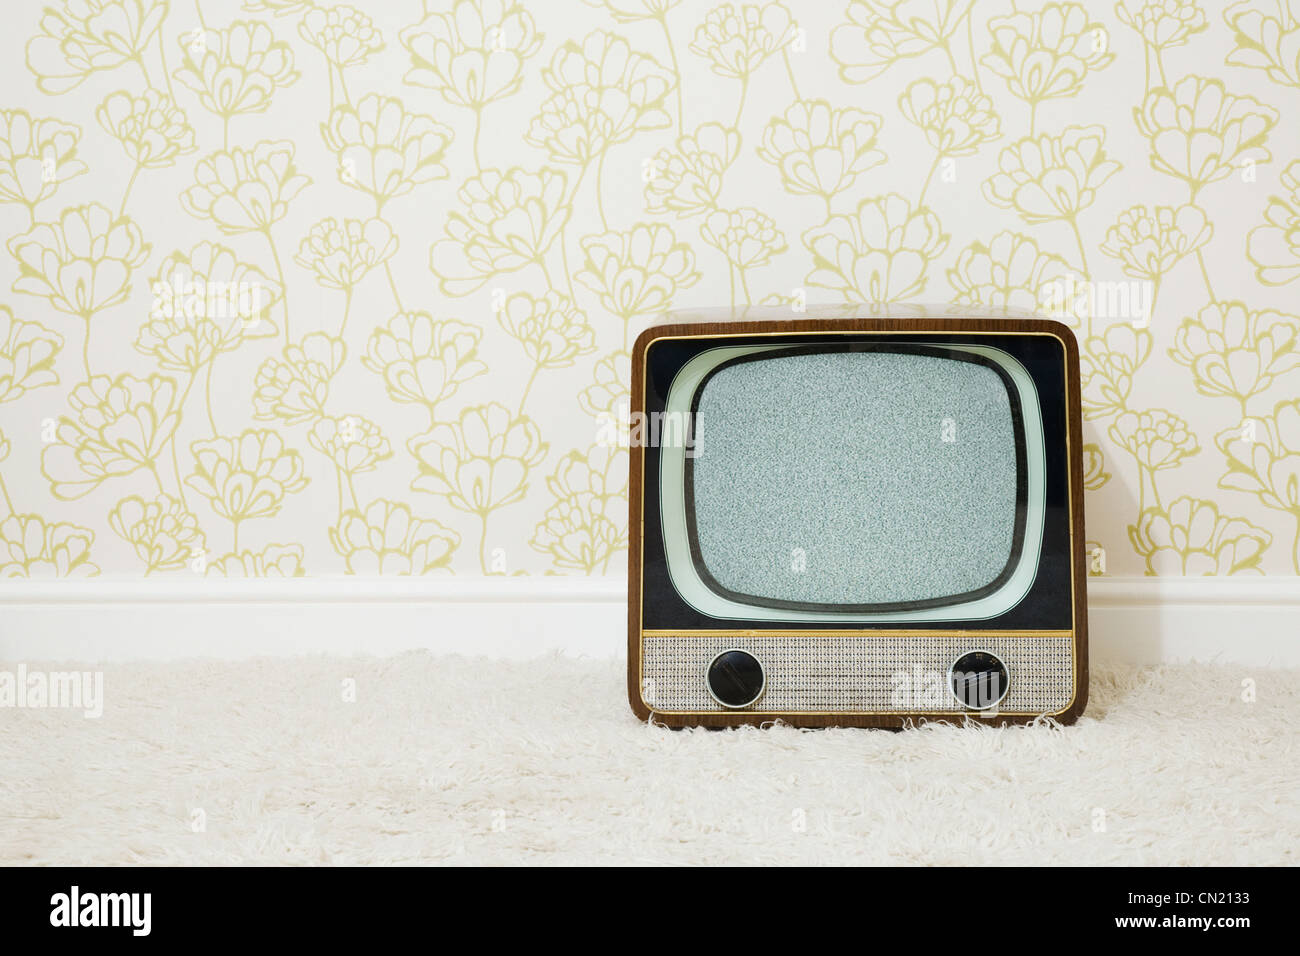 Retro-TV im Zimmer mit gemusterten Tapeten Stockfoto